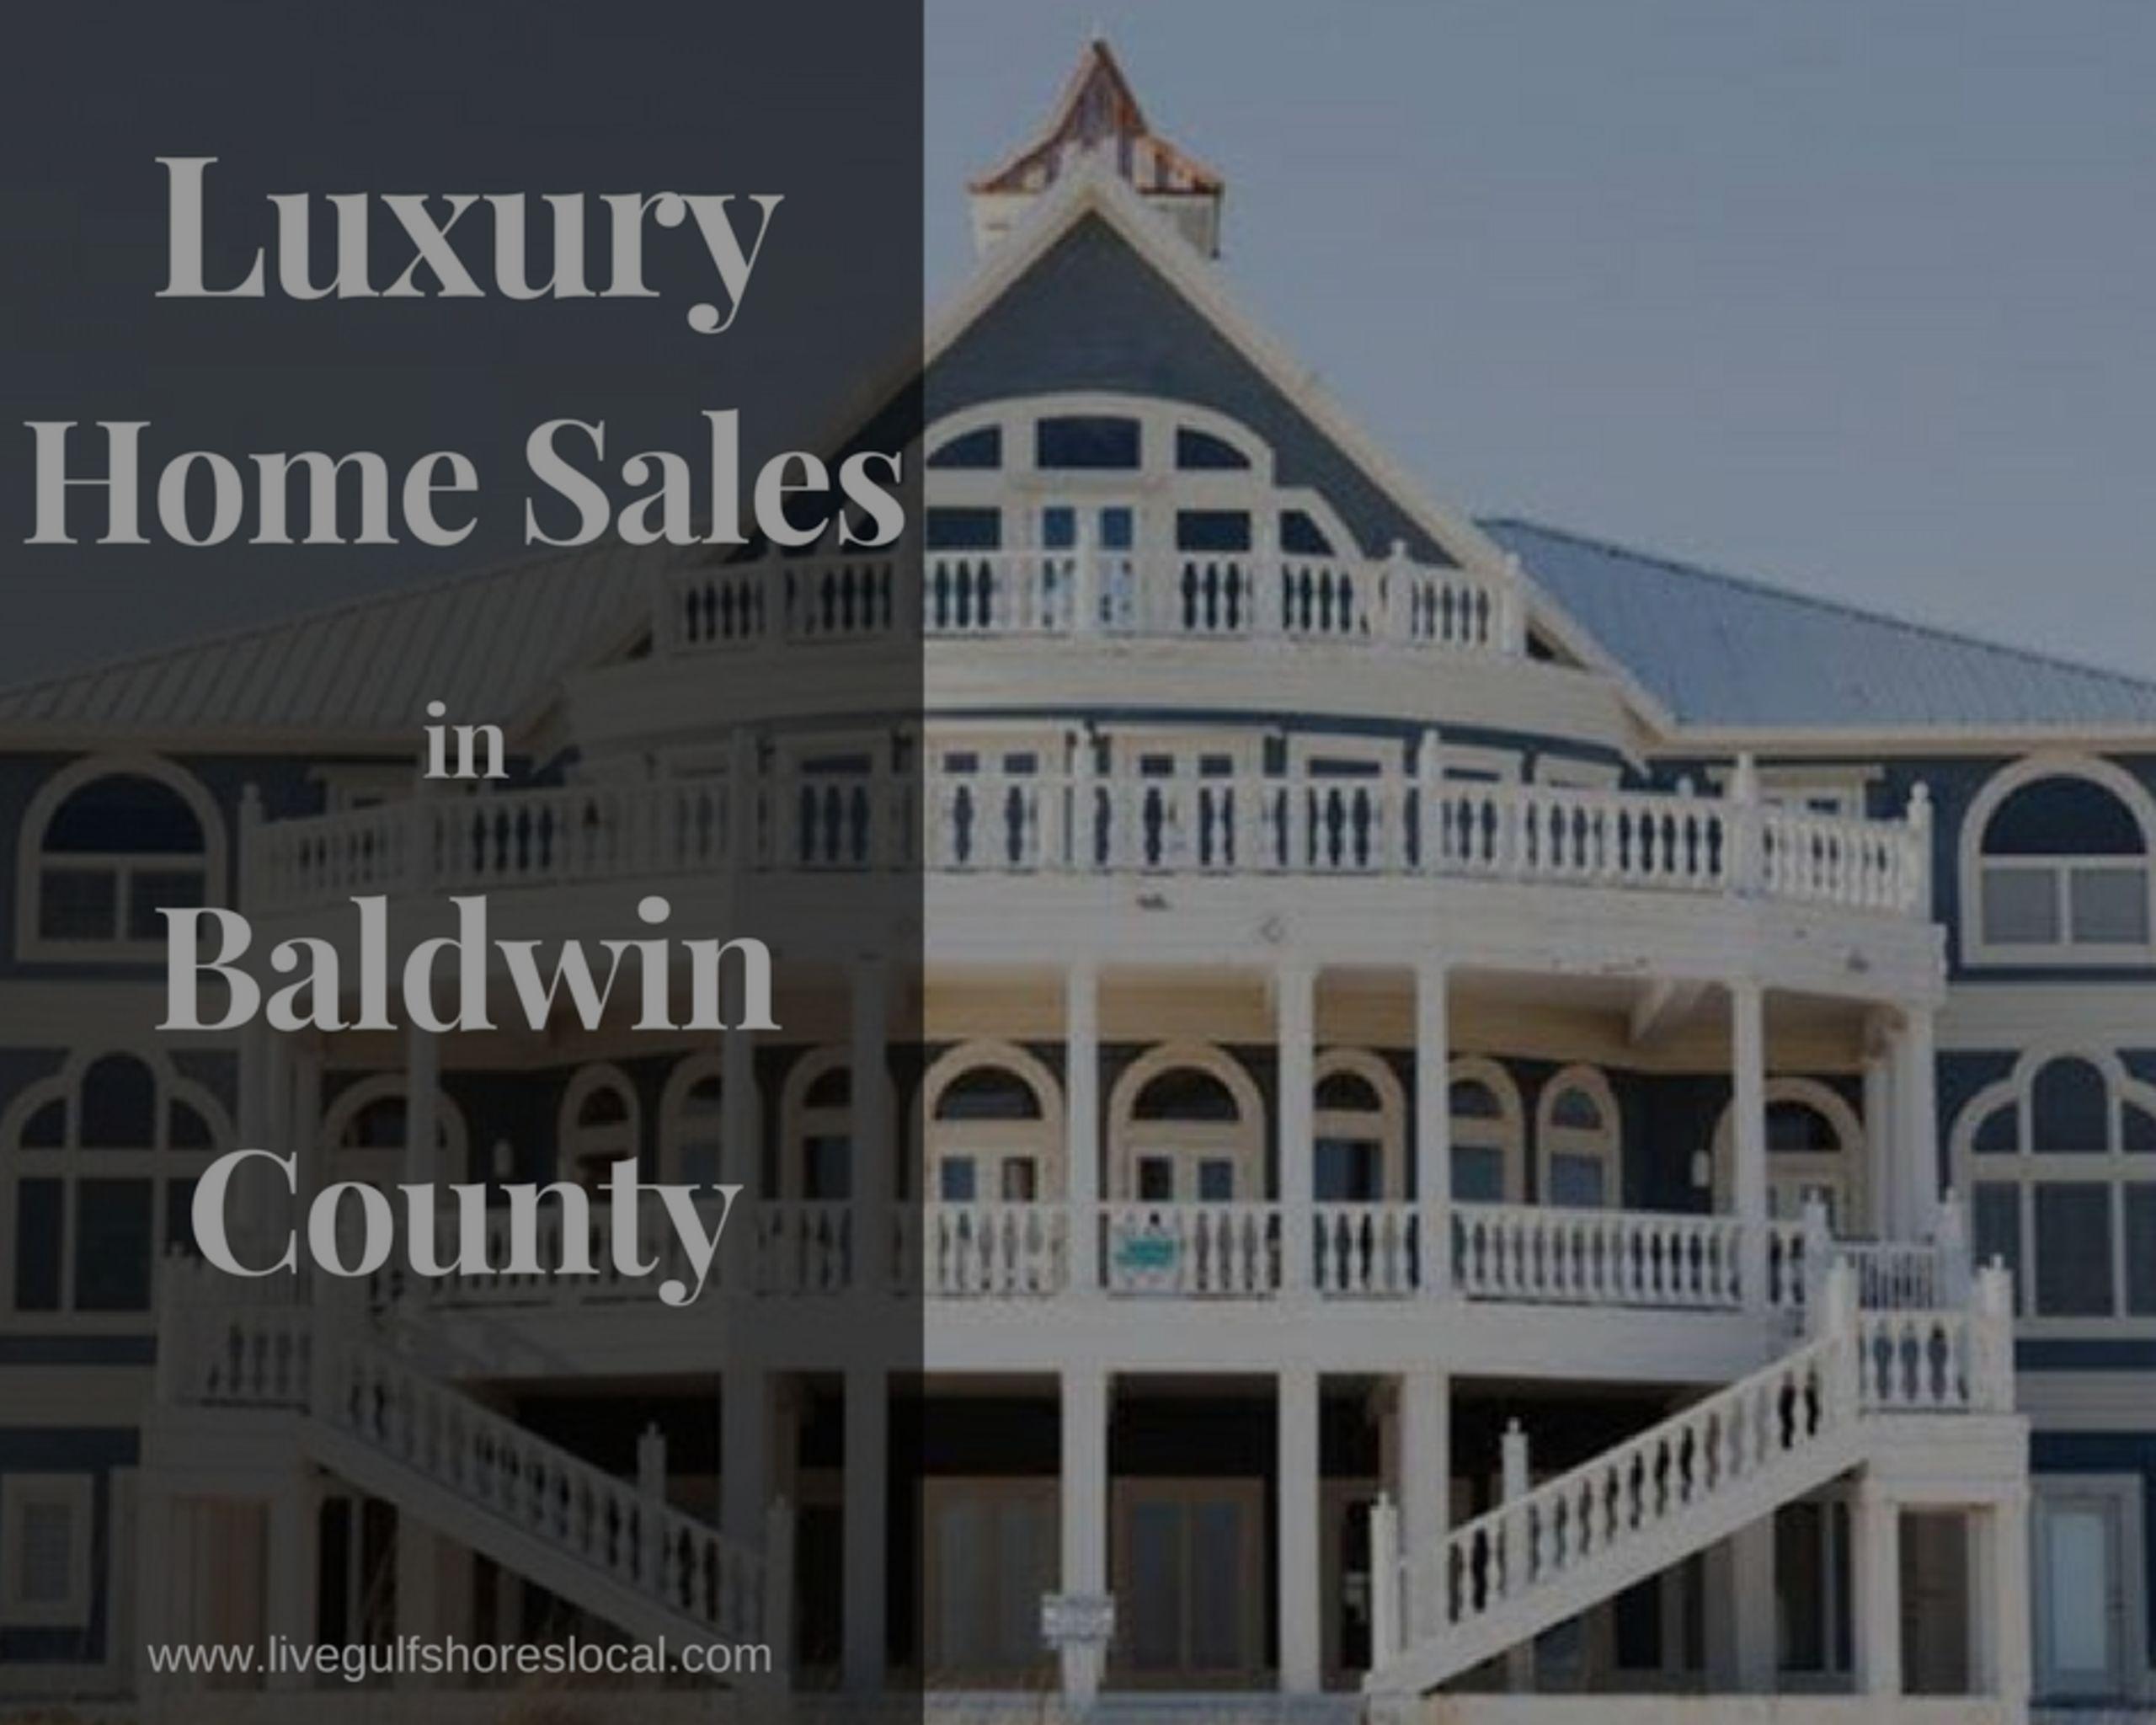 Luxury Home Sales in Baldwin County – February 2018